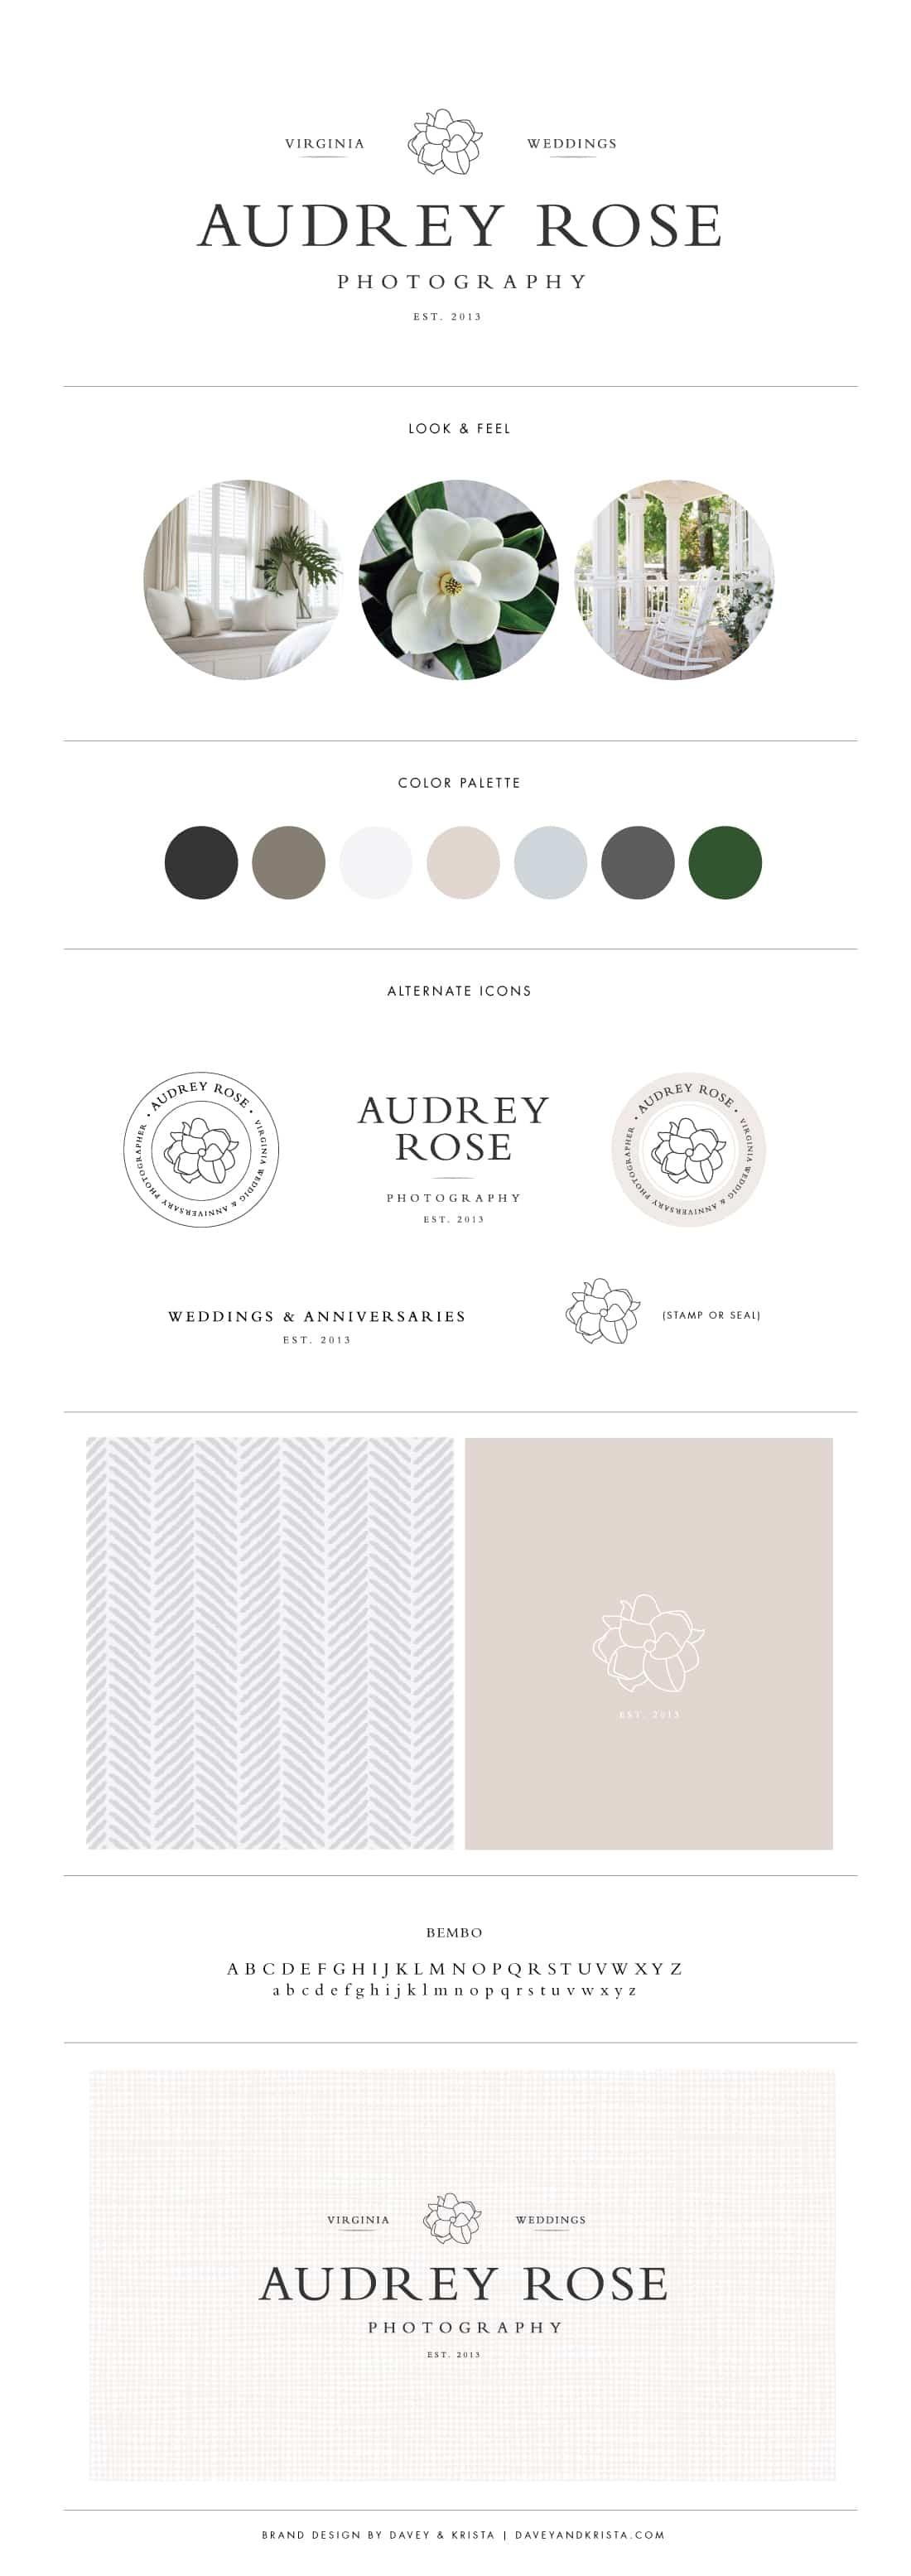 Southern inspired brand design for wedding photographer Audrey Rose | Davey & Krista